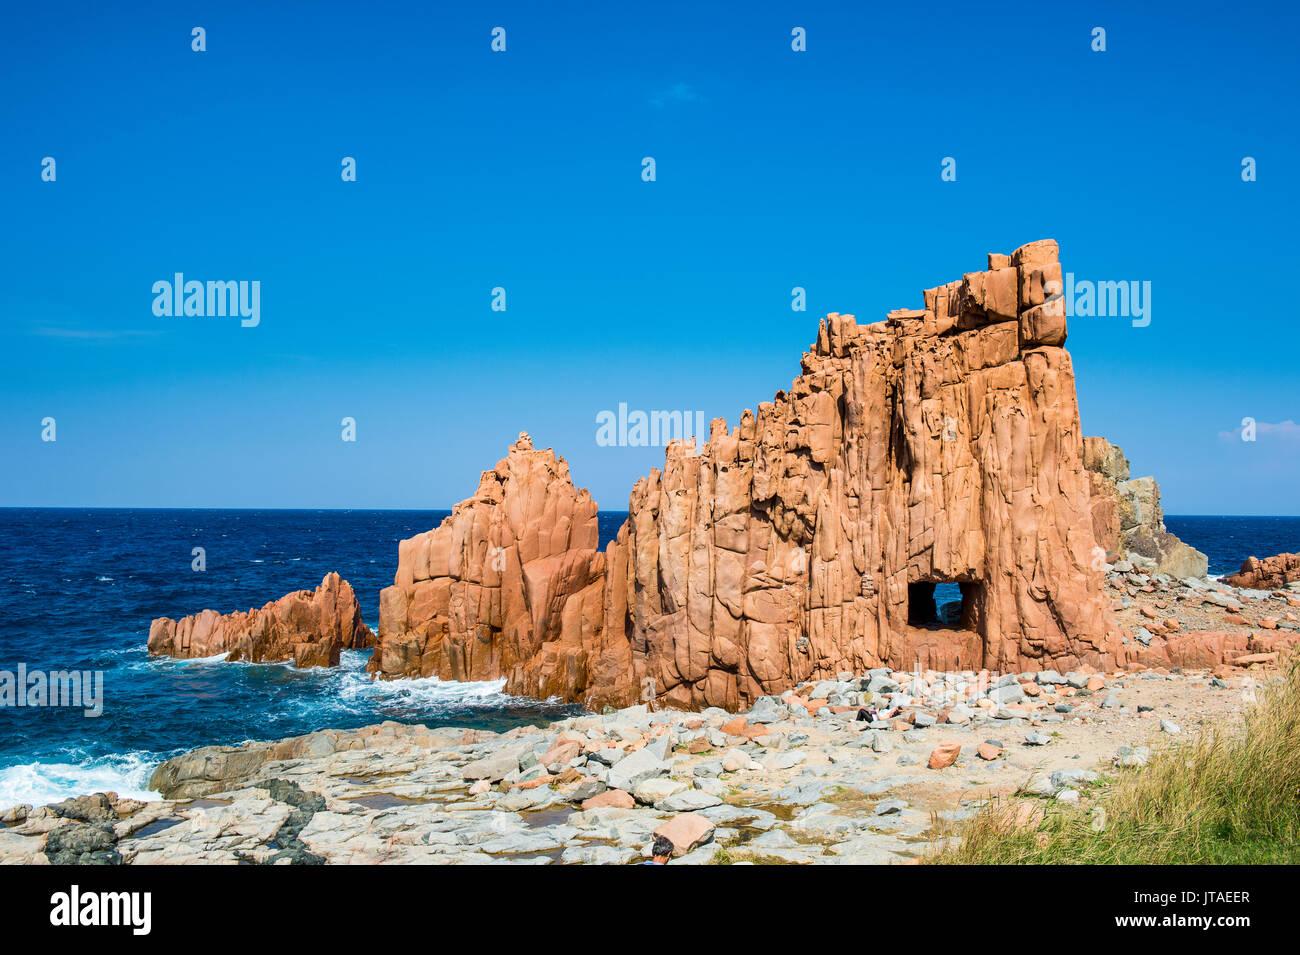 Beach of Rocce Rosse, Arbatax, Sardinia, Italy, Mediterranean, Europe - Stock Image